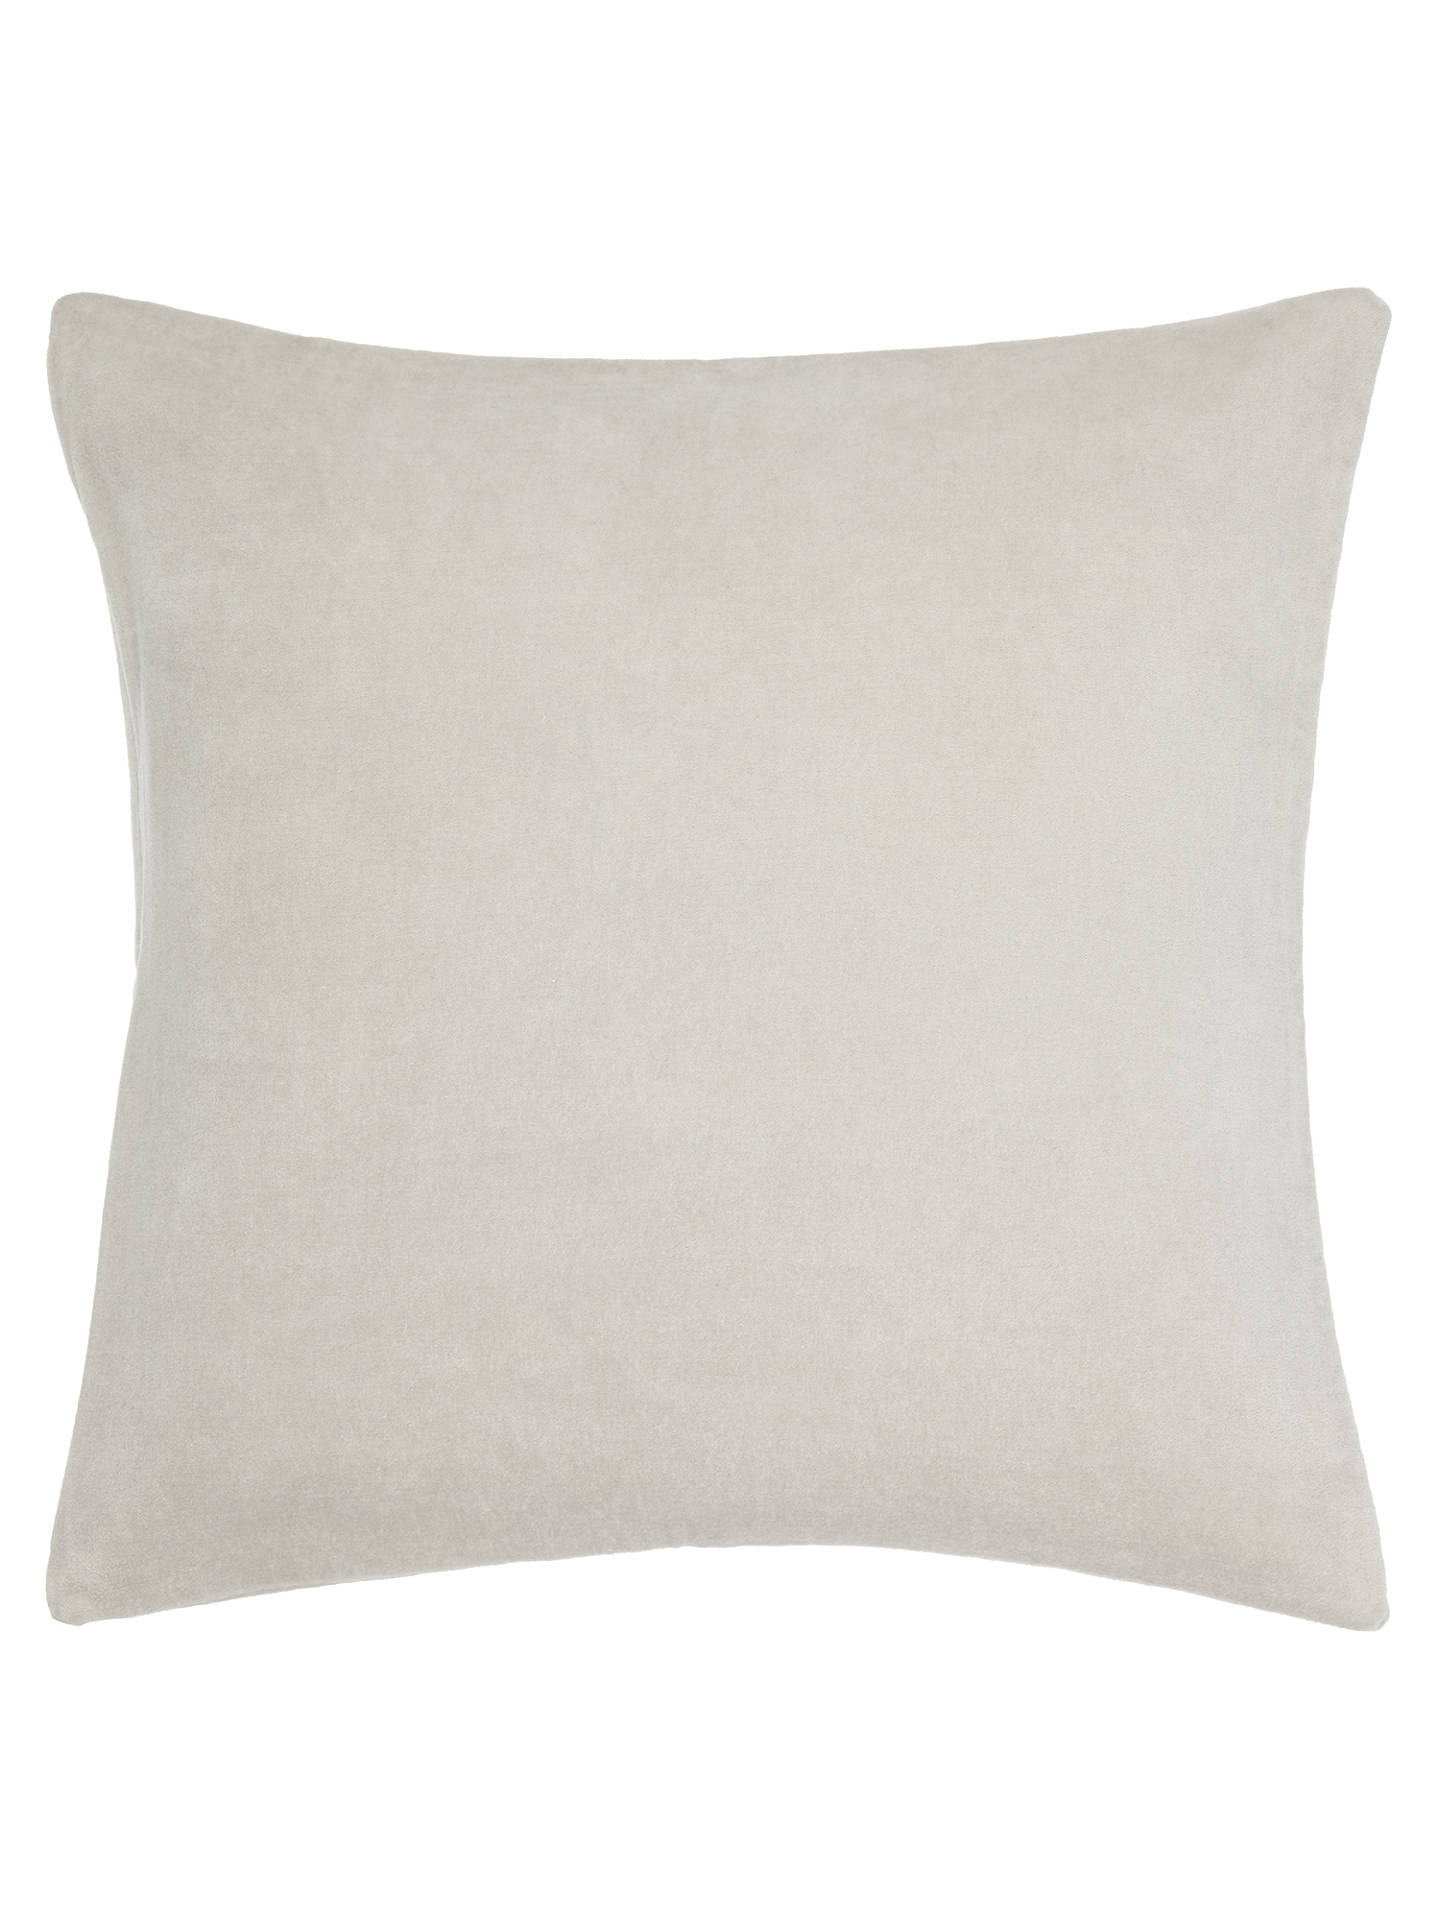 john lewis plain velvet cushion at john lewis partners. Black Bedroom Furniture Sets. Home Design Ideas